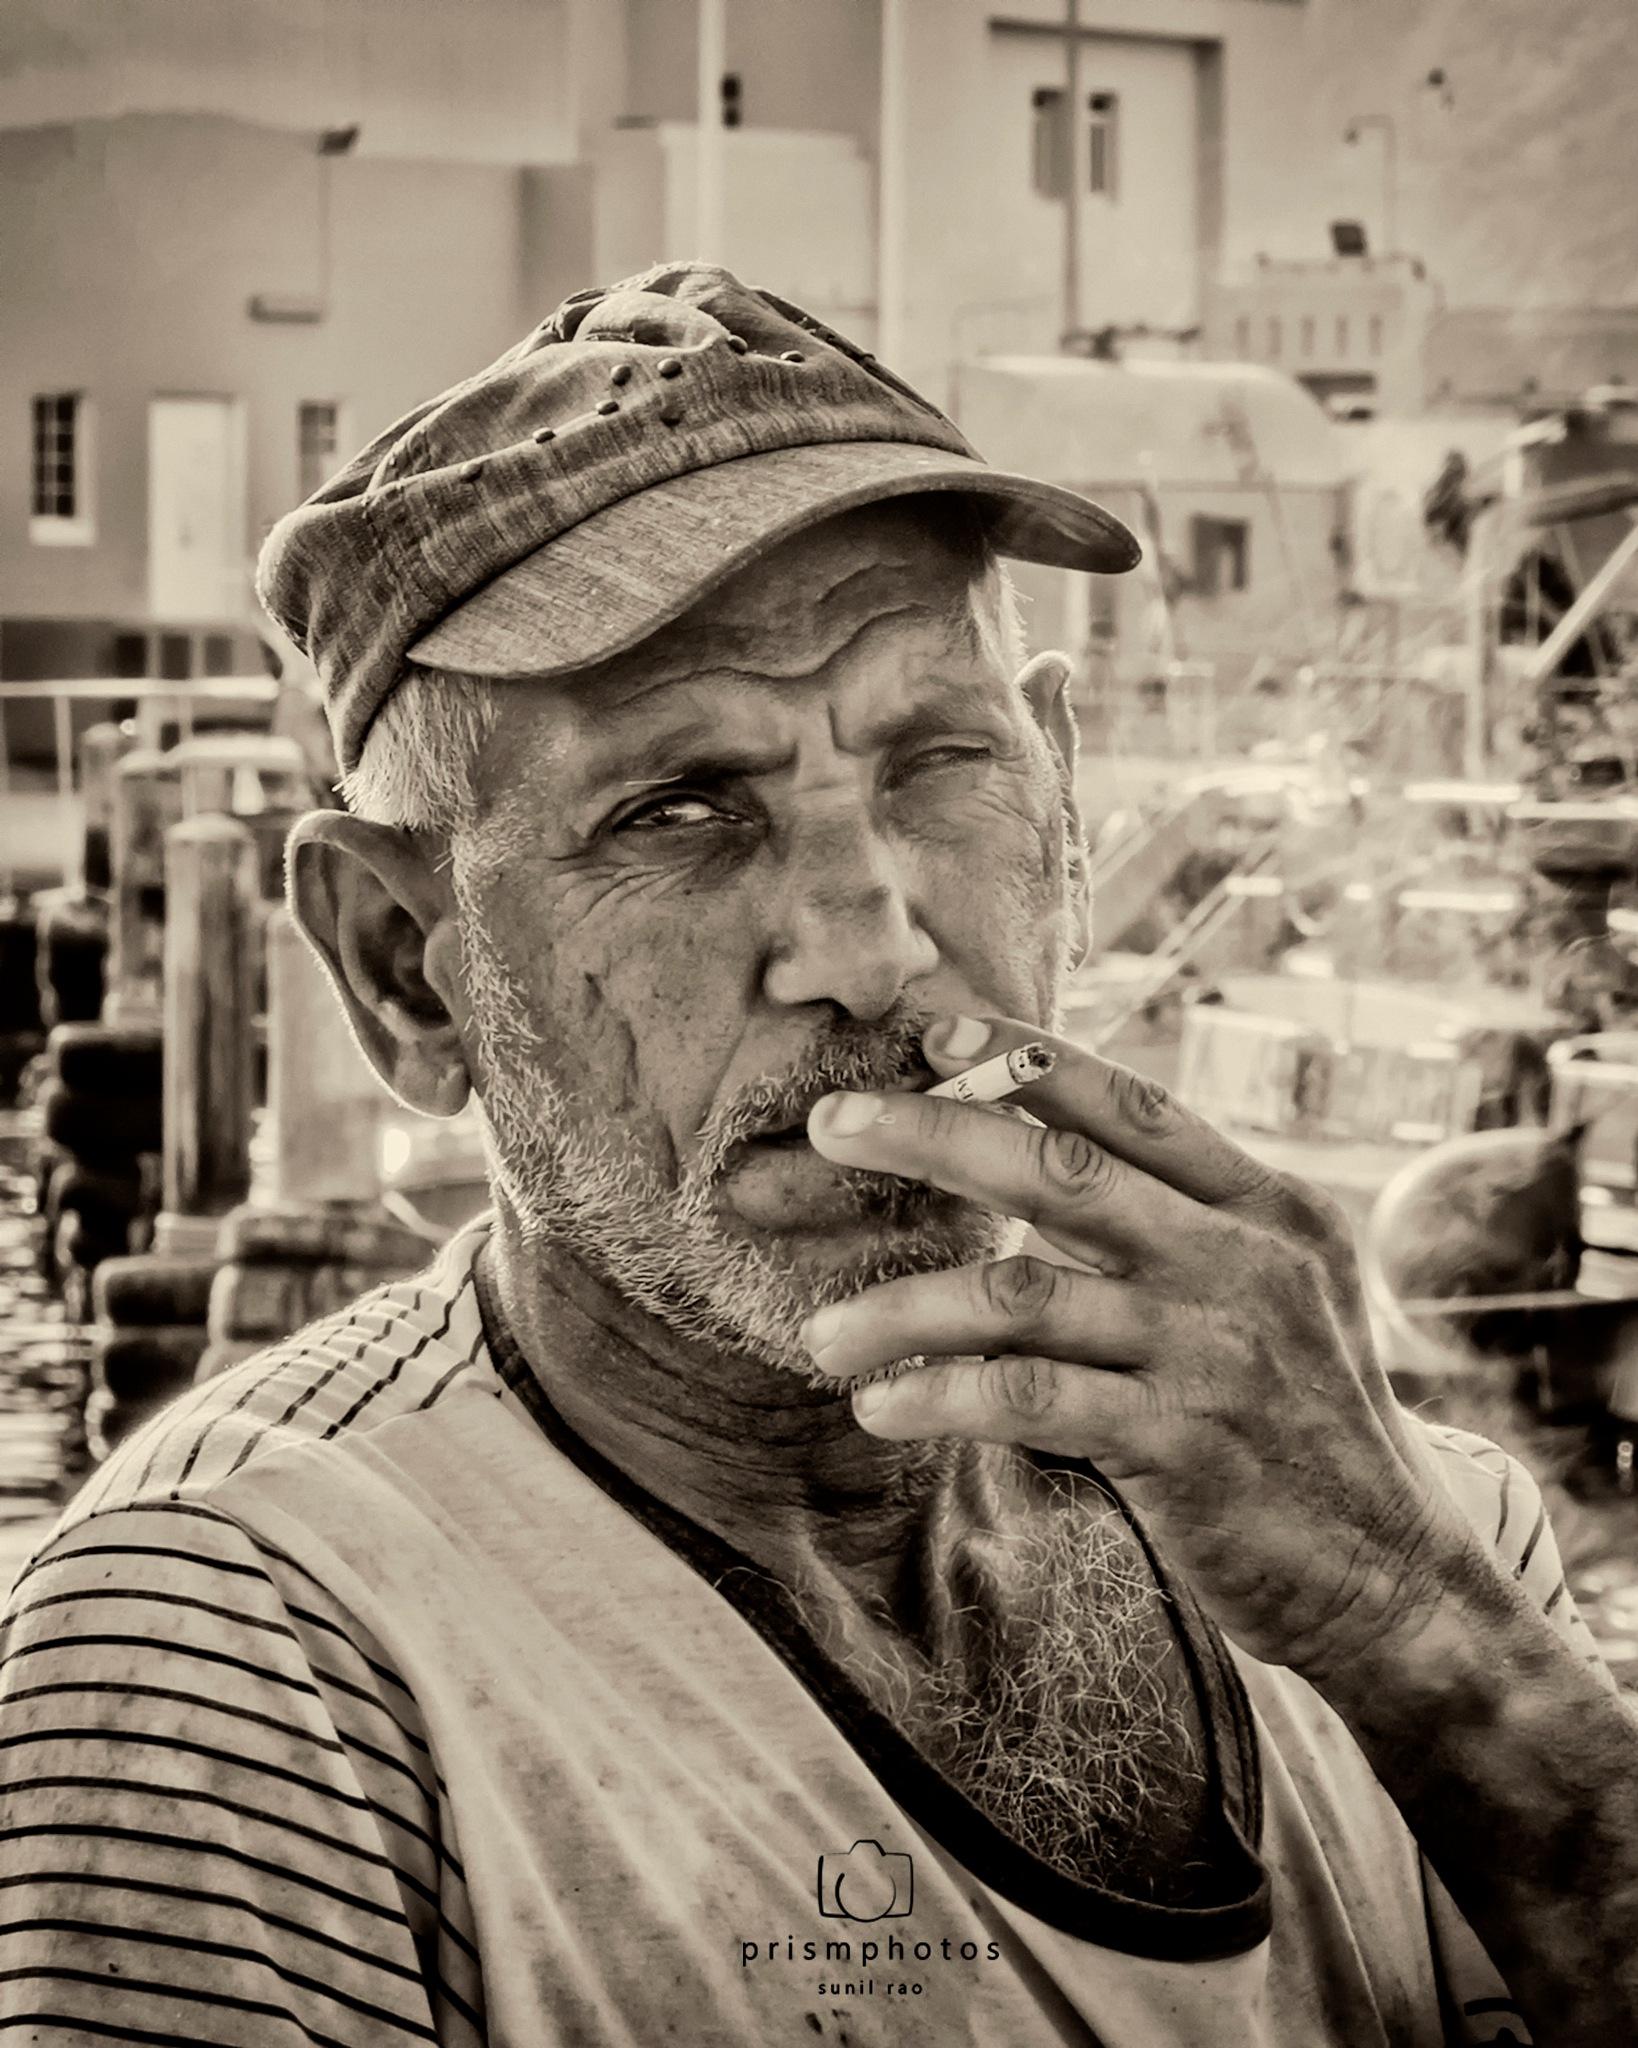 BREAK TIME by prismphotos - sunil rao